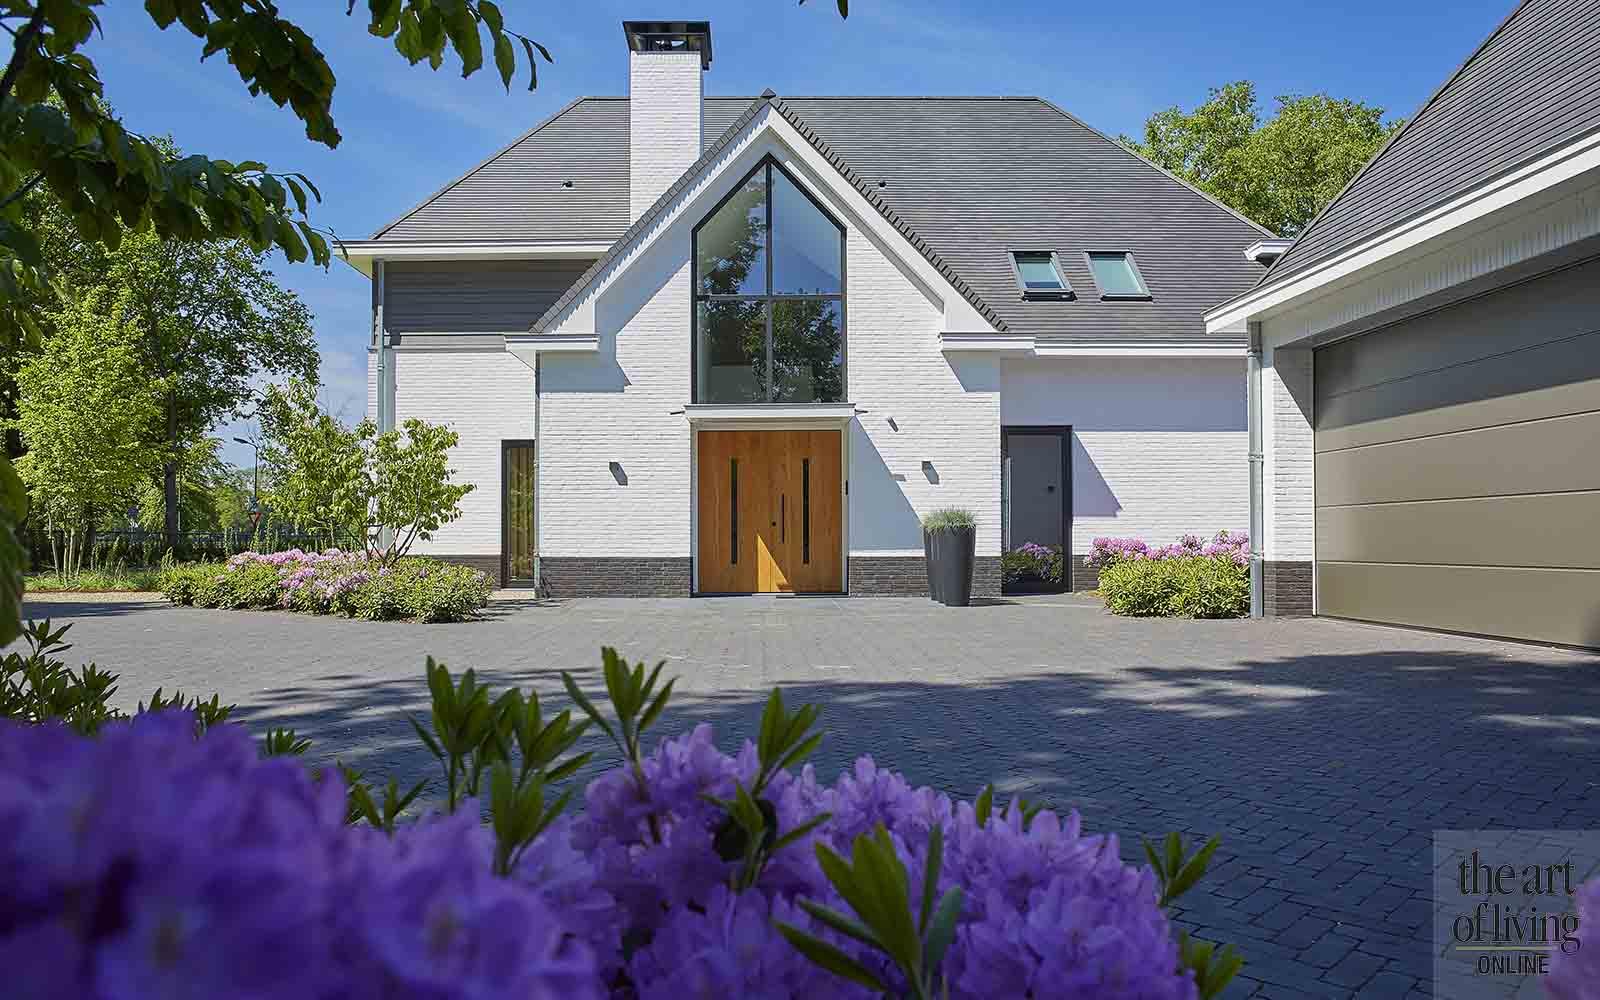 Luxe villa | Drijvers, the art of living